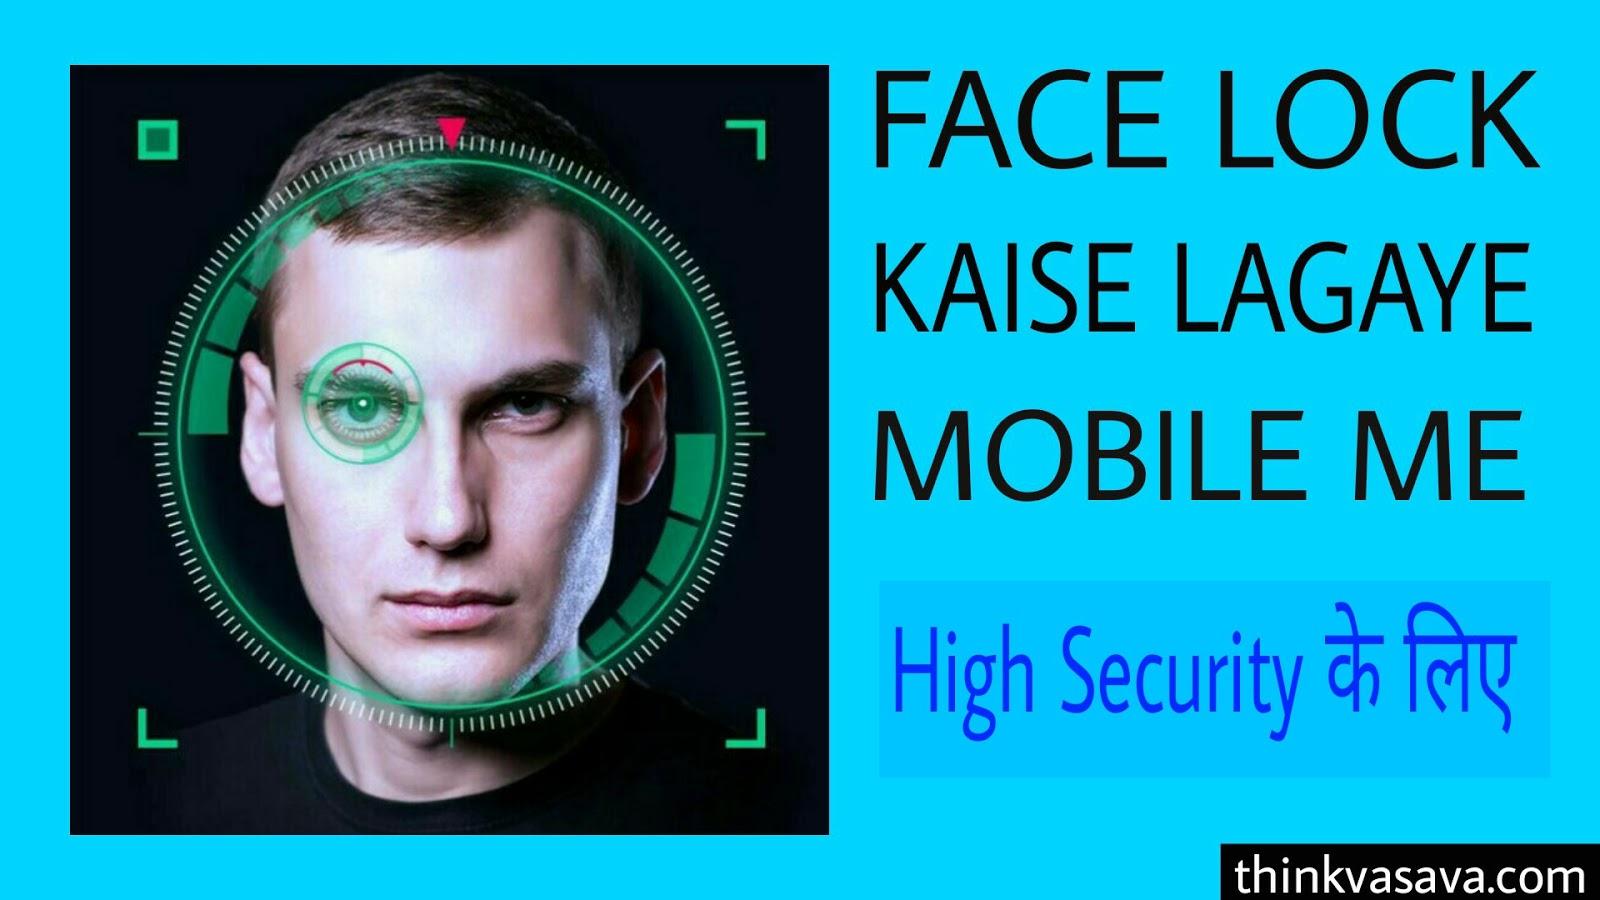 Face Lock Kaise Lagaye Mobile Me